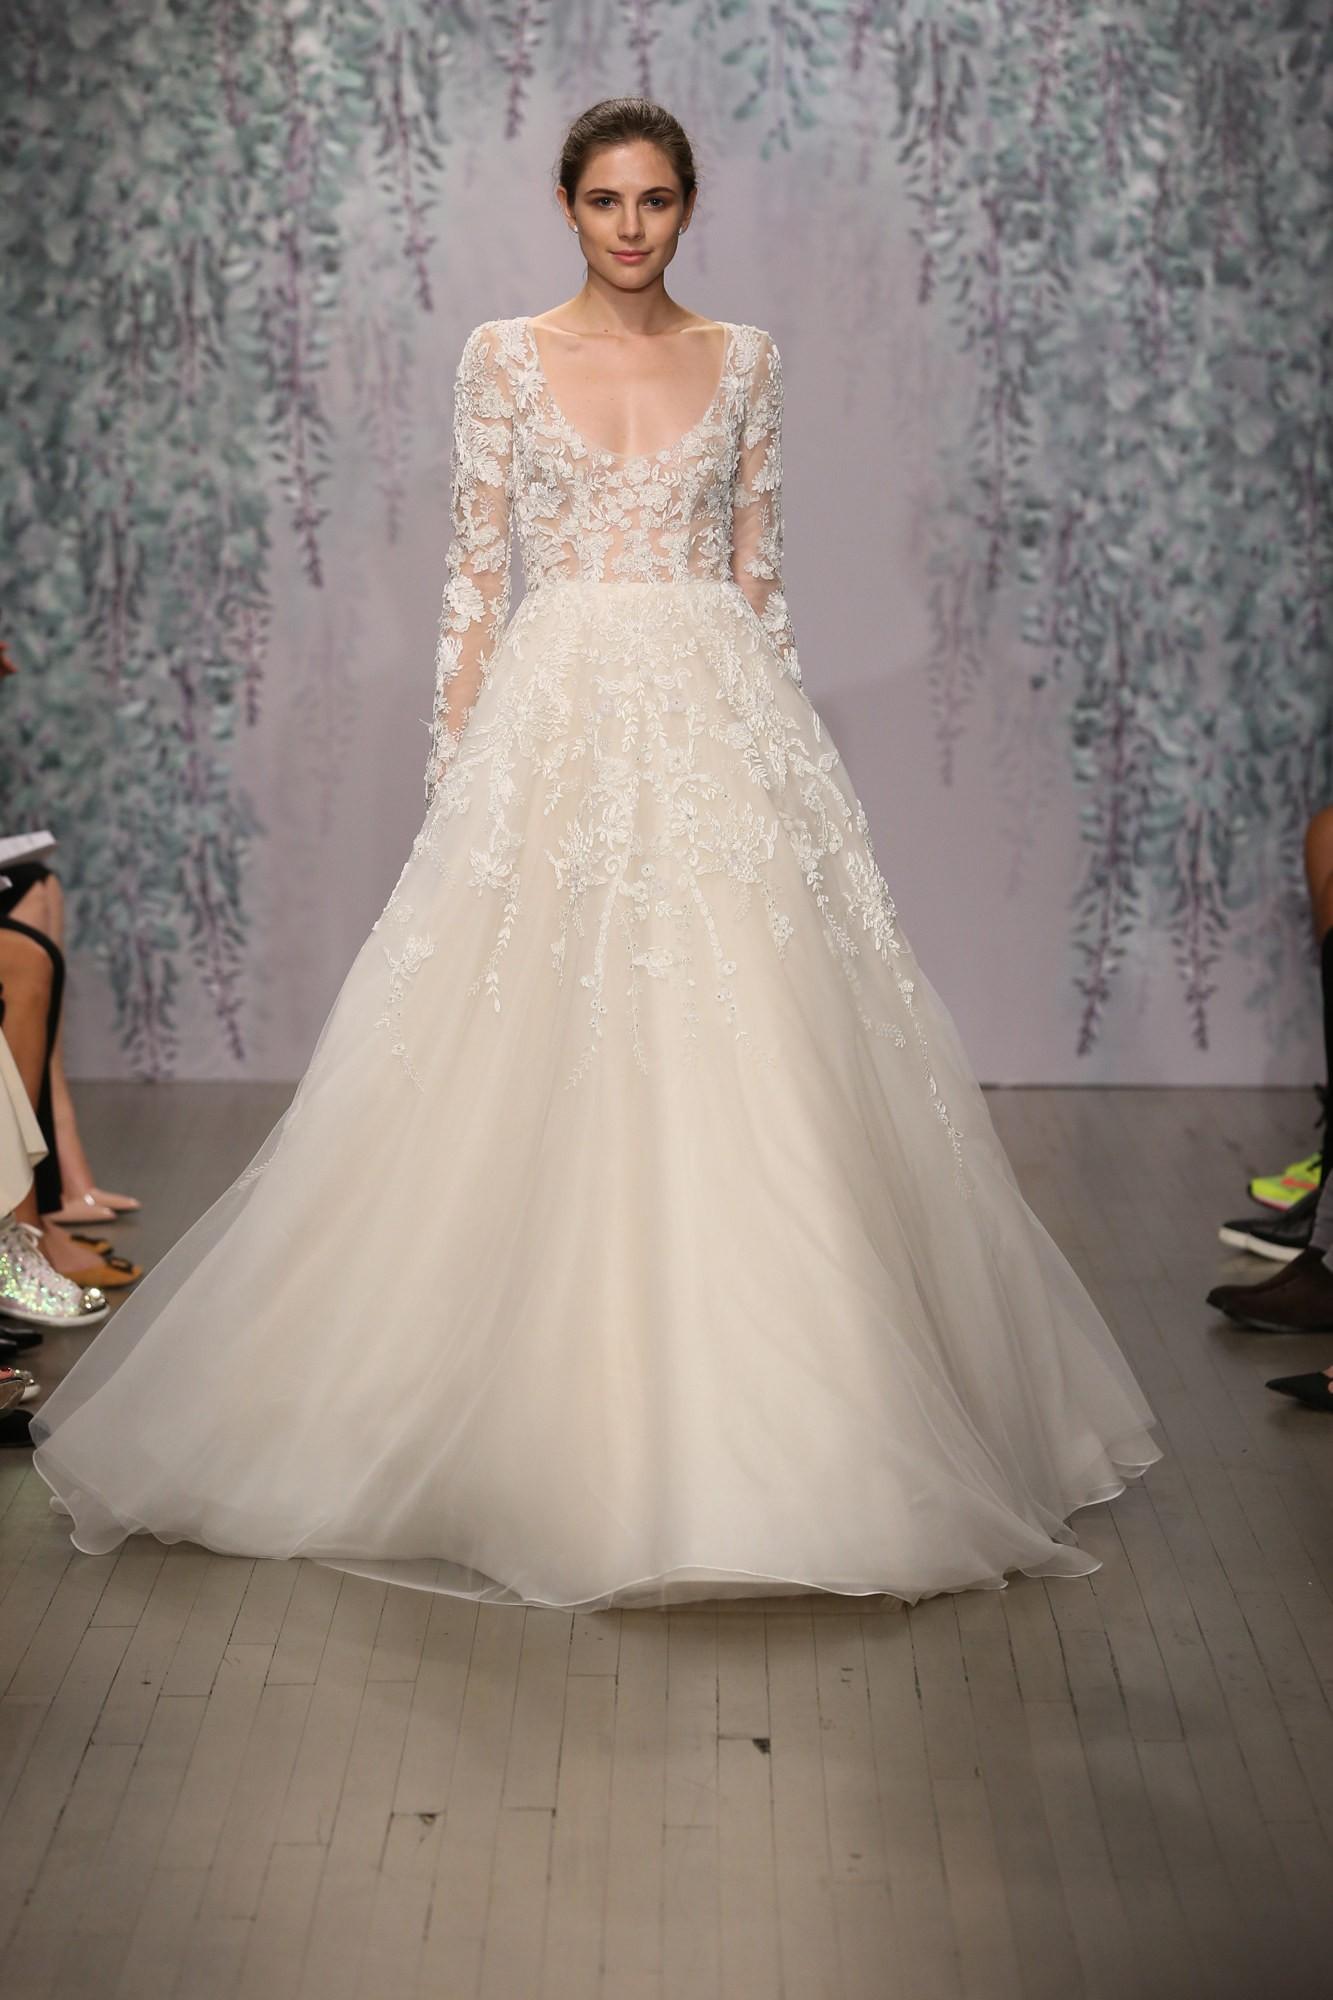 2ce08ad15 أفضل محلات فساتين زفاف بالرياض مع الصور والأسعار